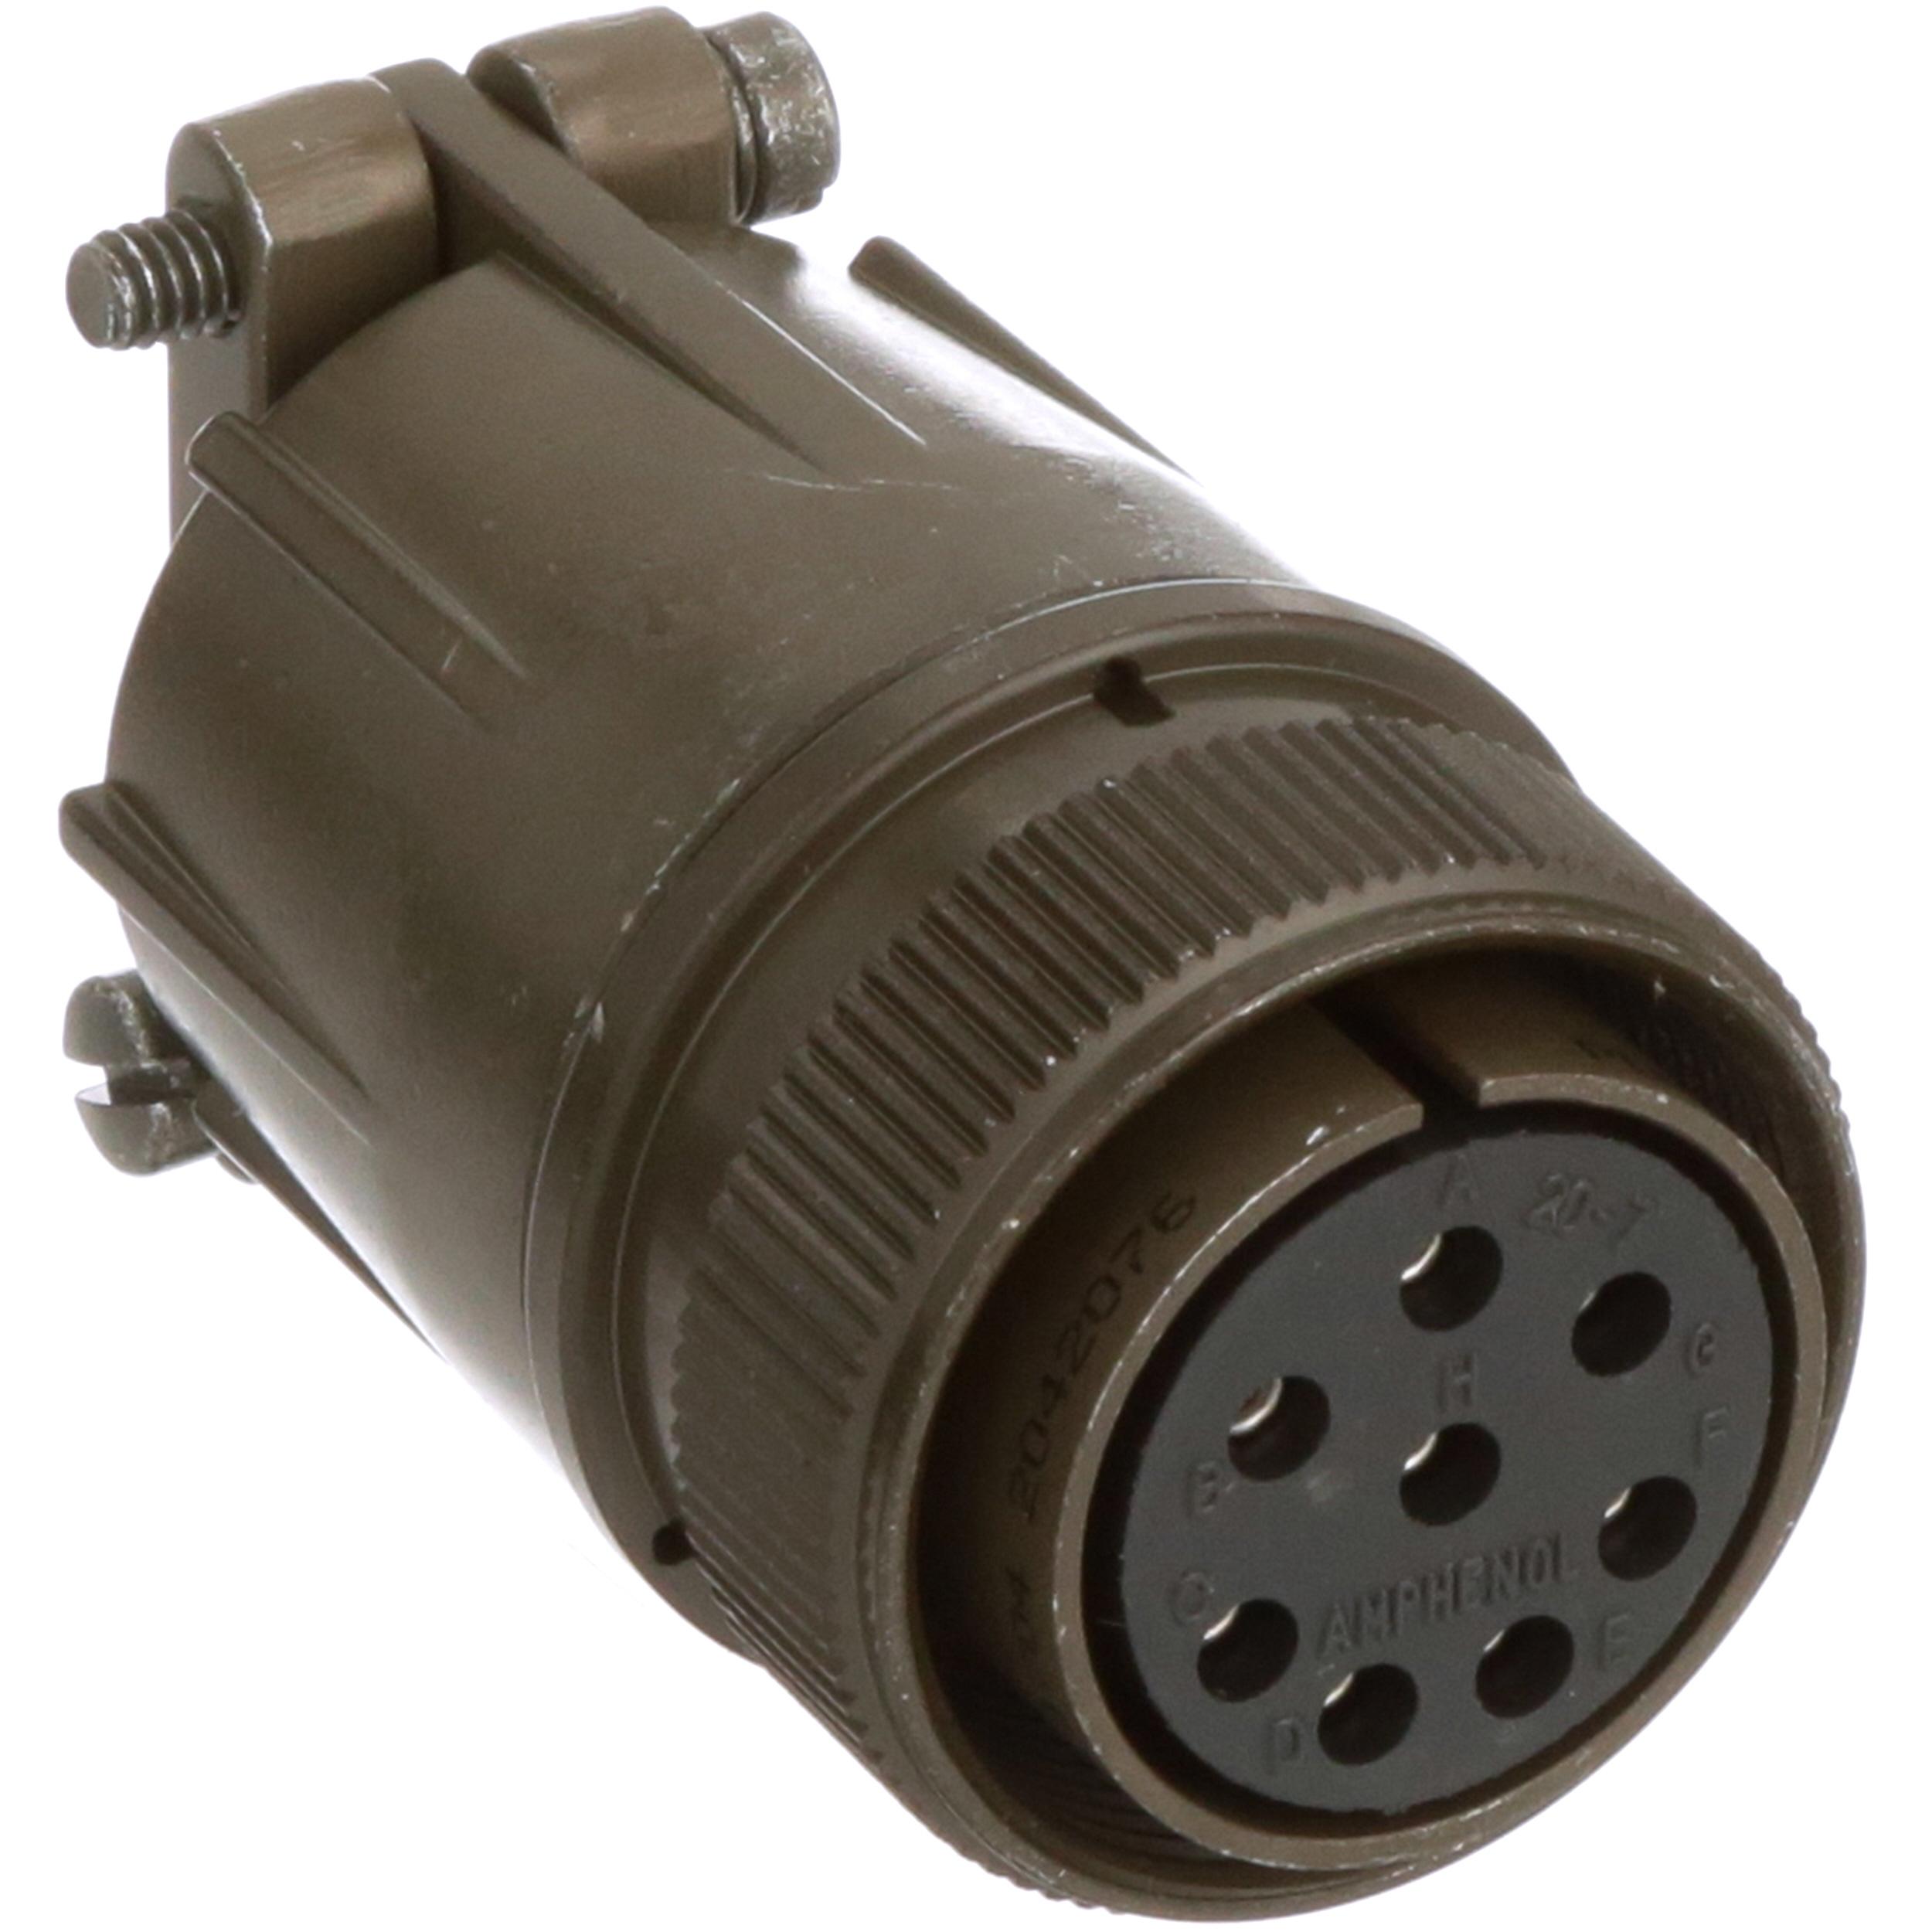 KC3225A27.0000C30E00 25 Items Oscillator XO 27MHz /±50ppm 15pF CMOS 55/% 3.3V 4-Pin SMD T//R